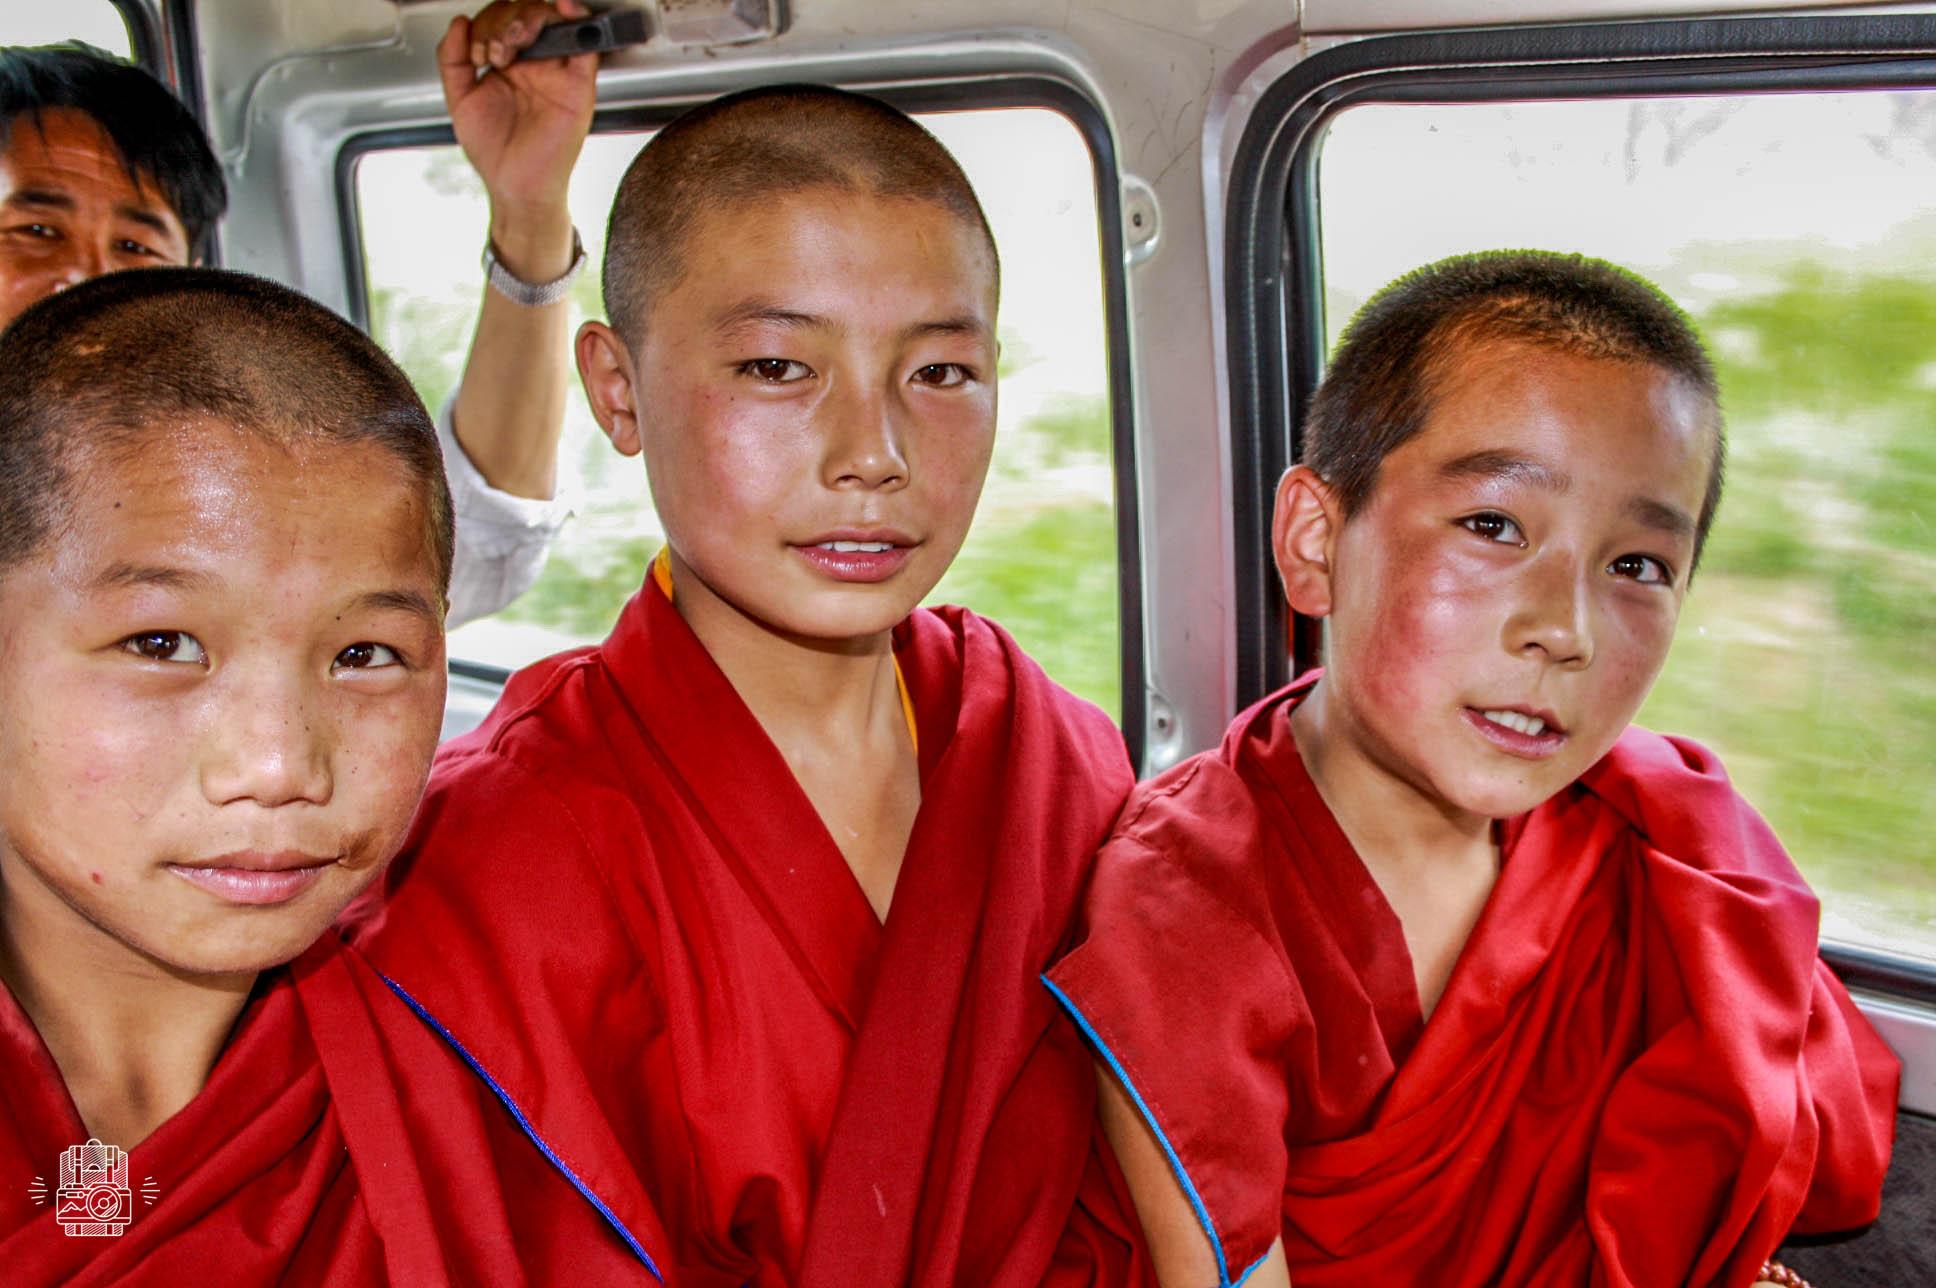 Chine/Frontière du Tibet